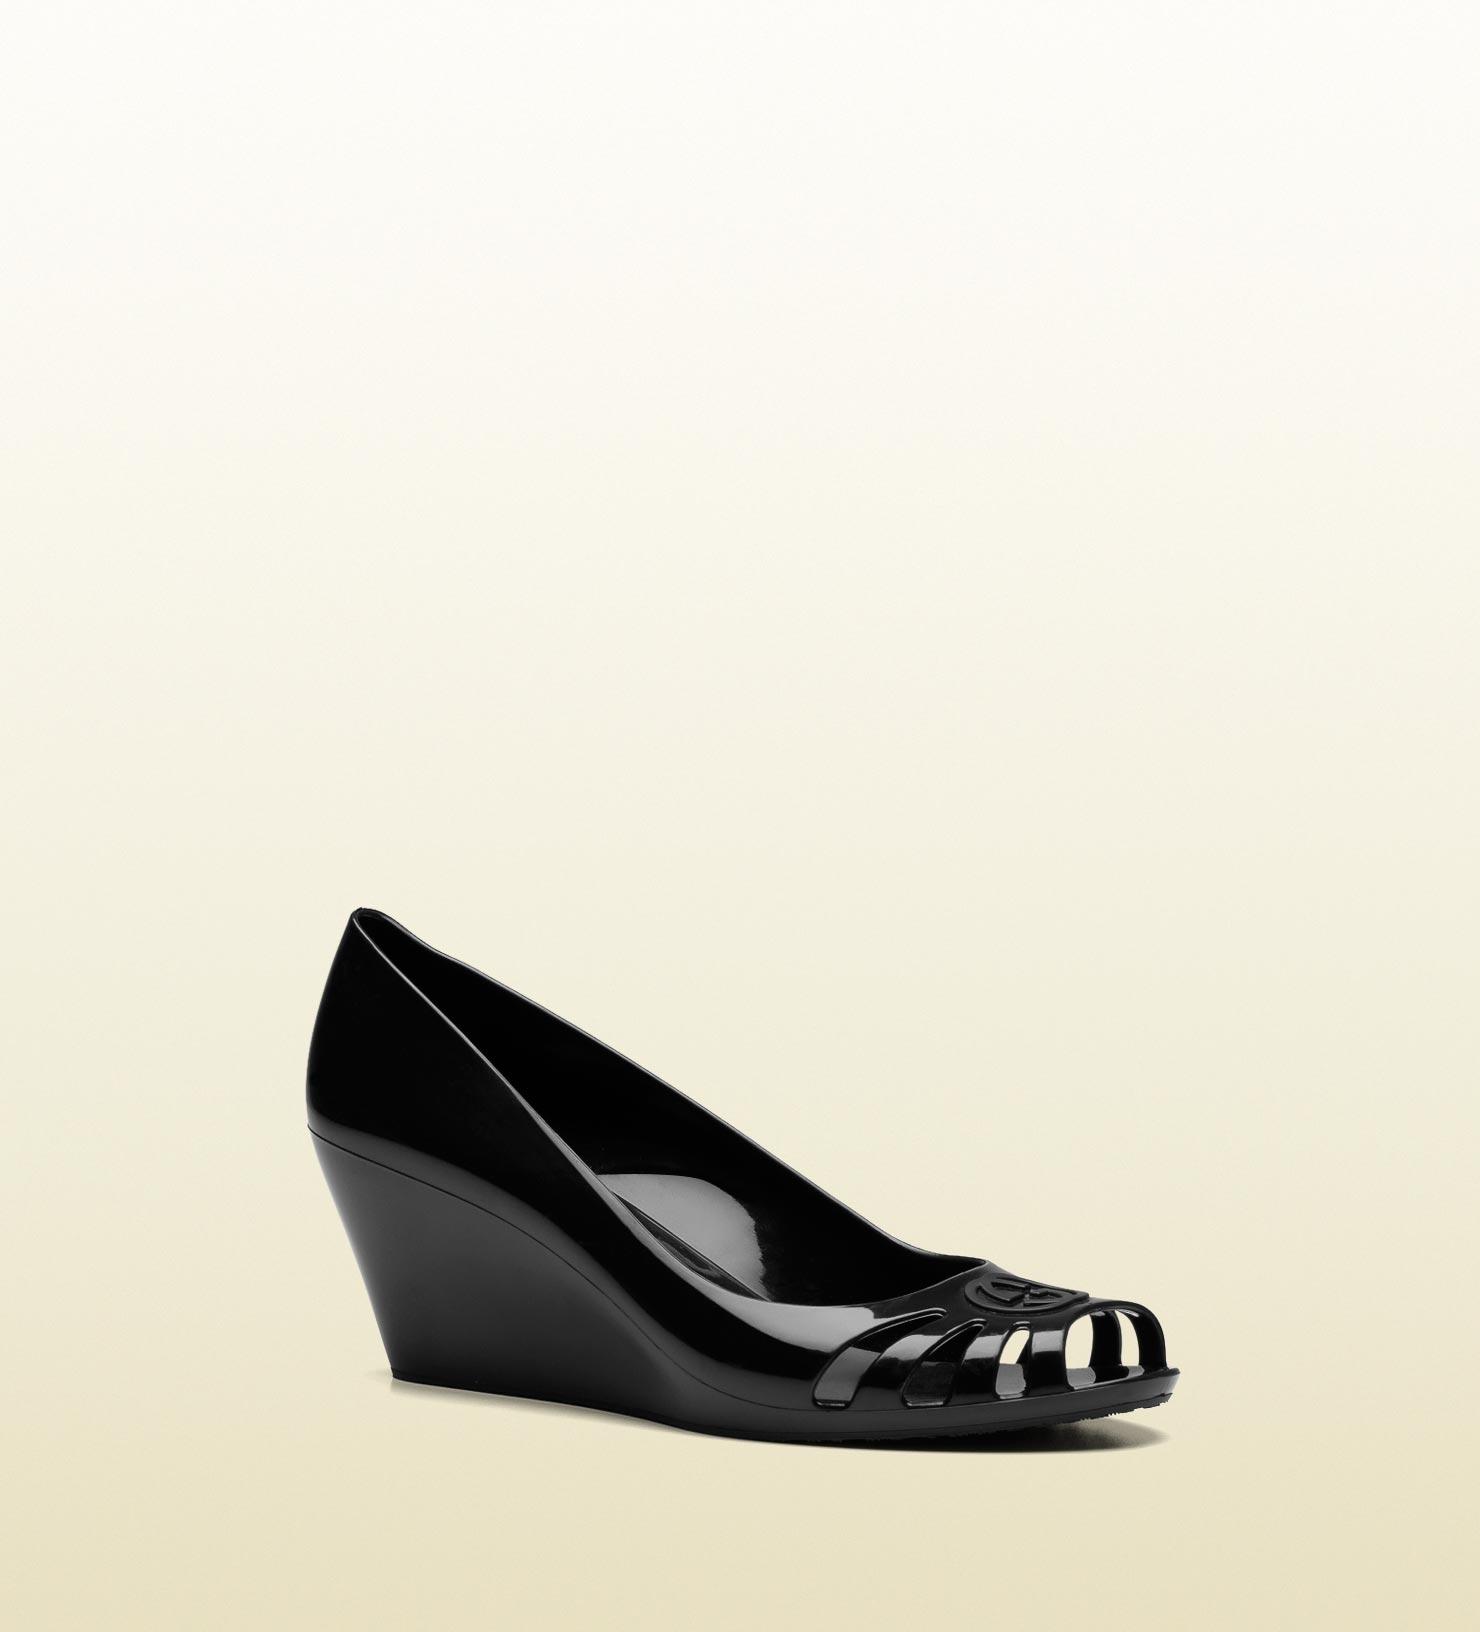 gucci interlocking g mid heel wedge sandal in black lyst